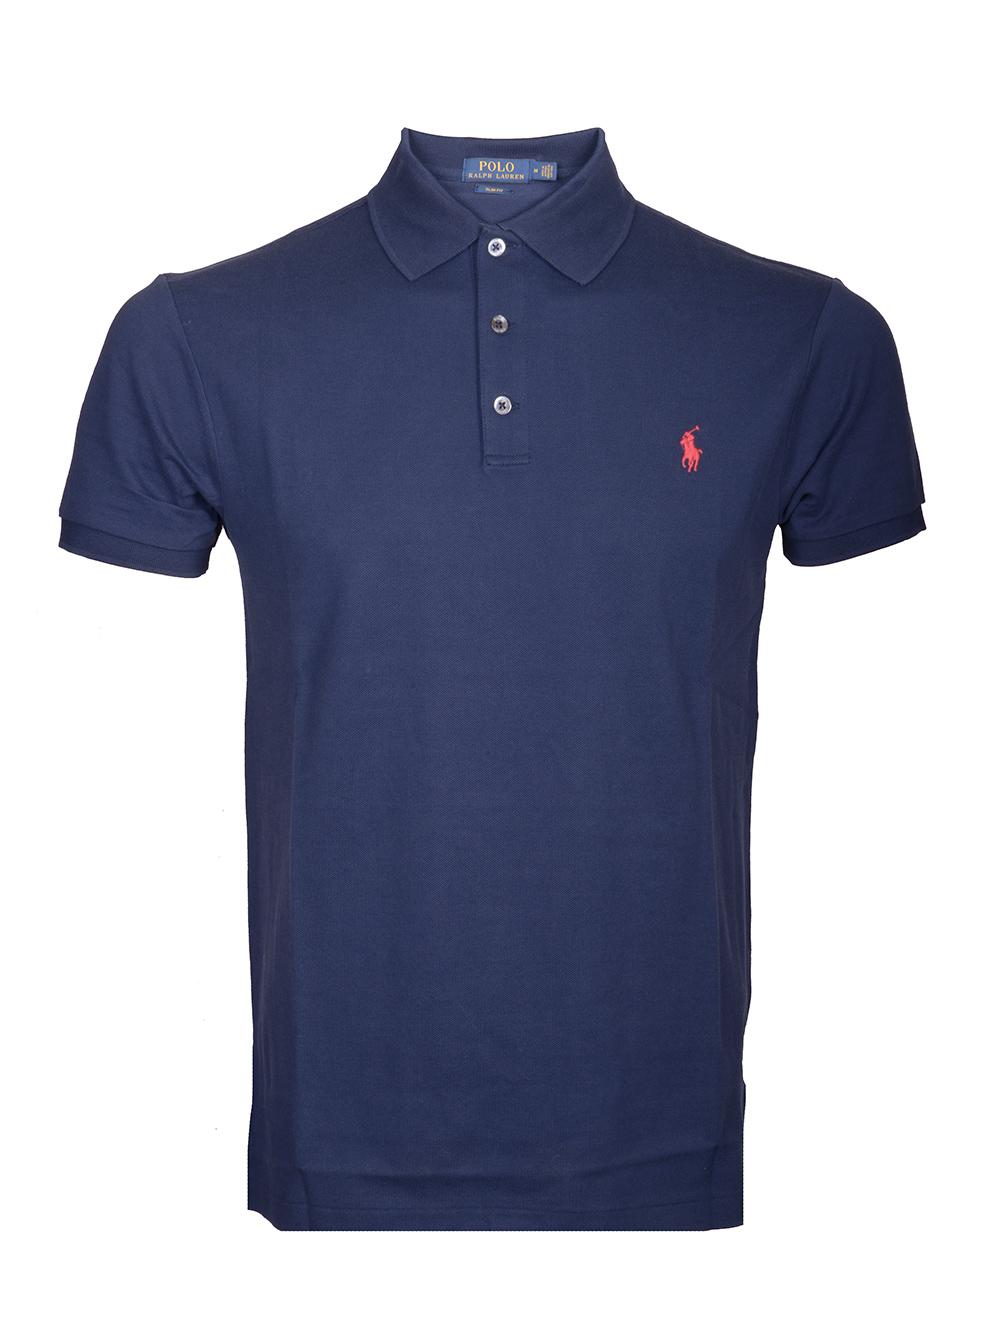 POLO RALPH LAUREN Μπλούζα Polo 710541705009 ΜΠΛΕ